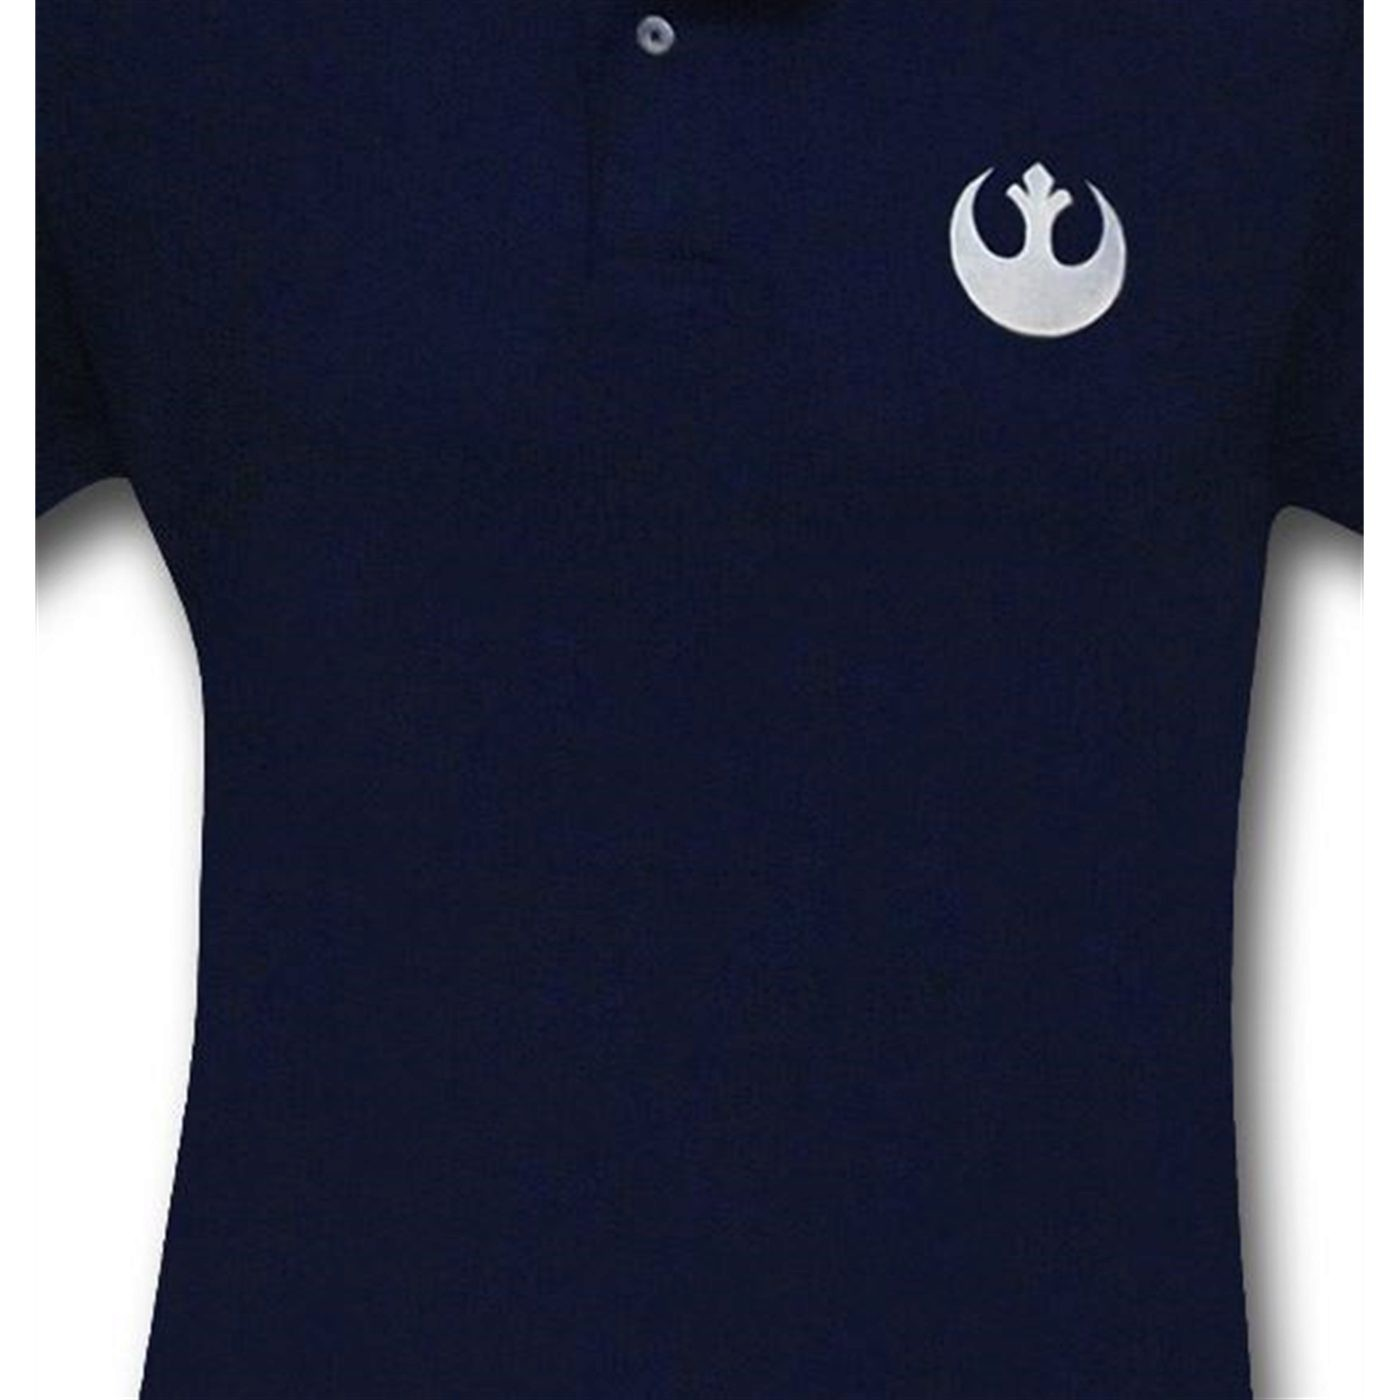 Star Wars Rebel Symbol Navy Polo Shirt